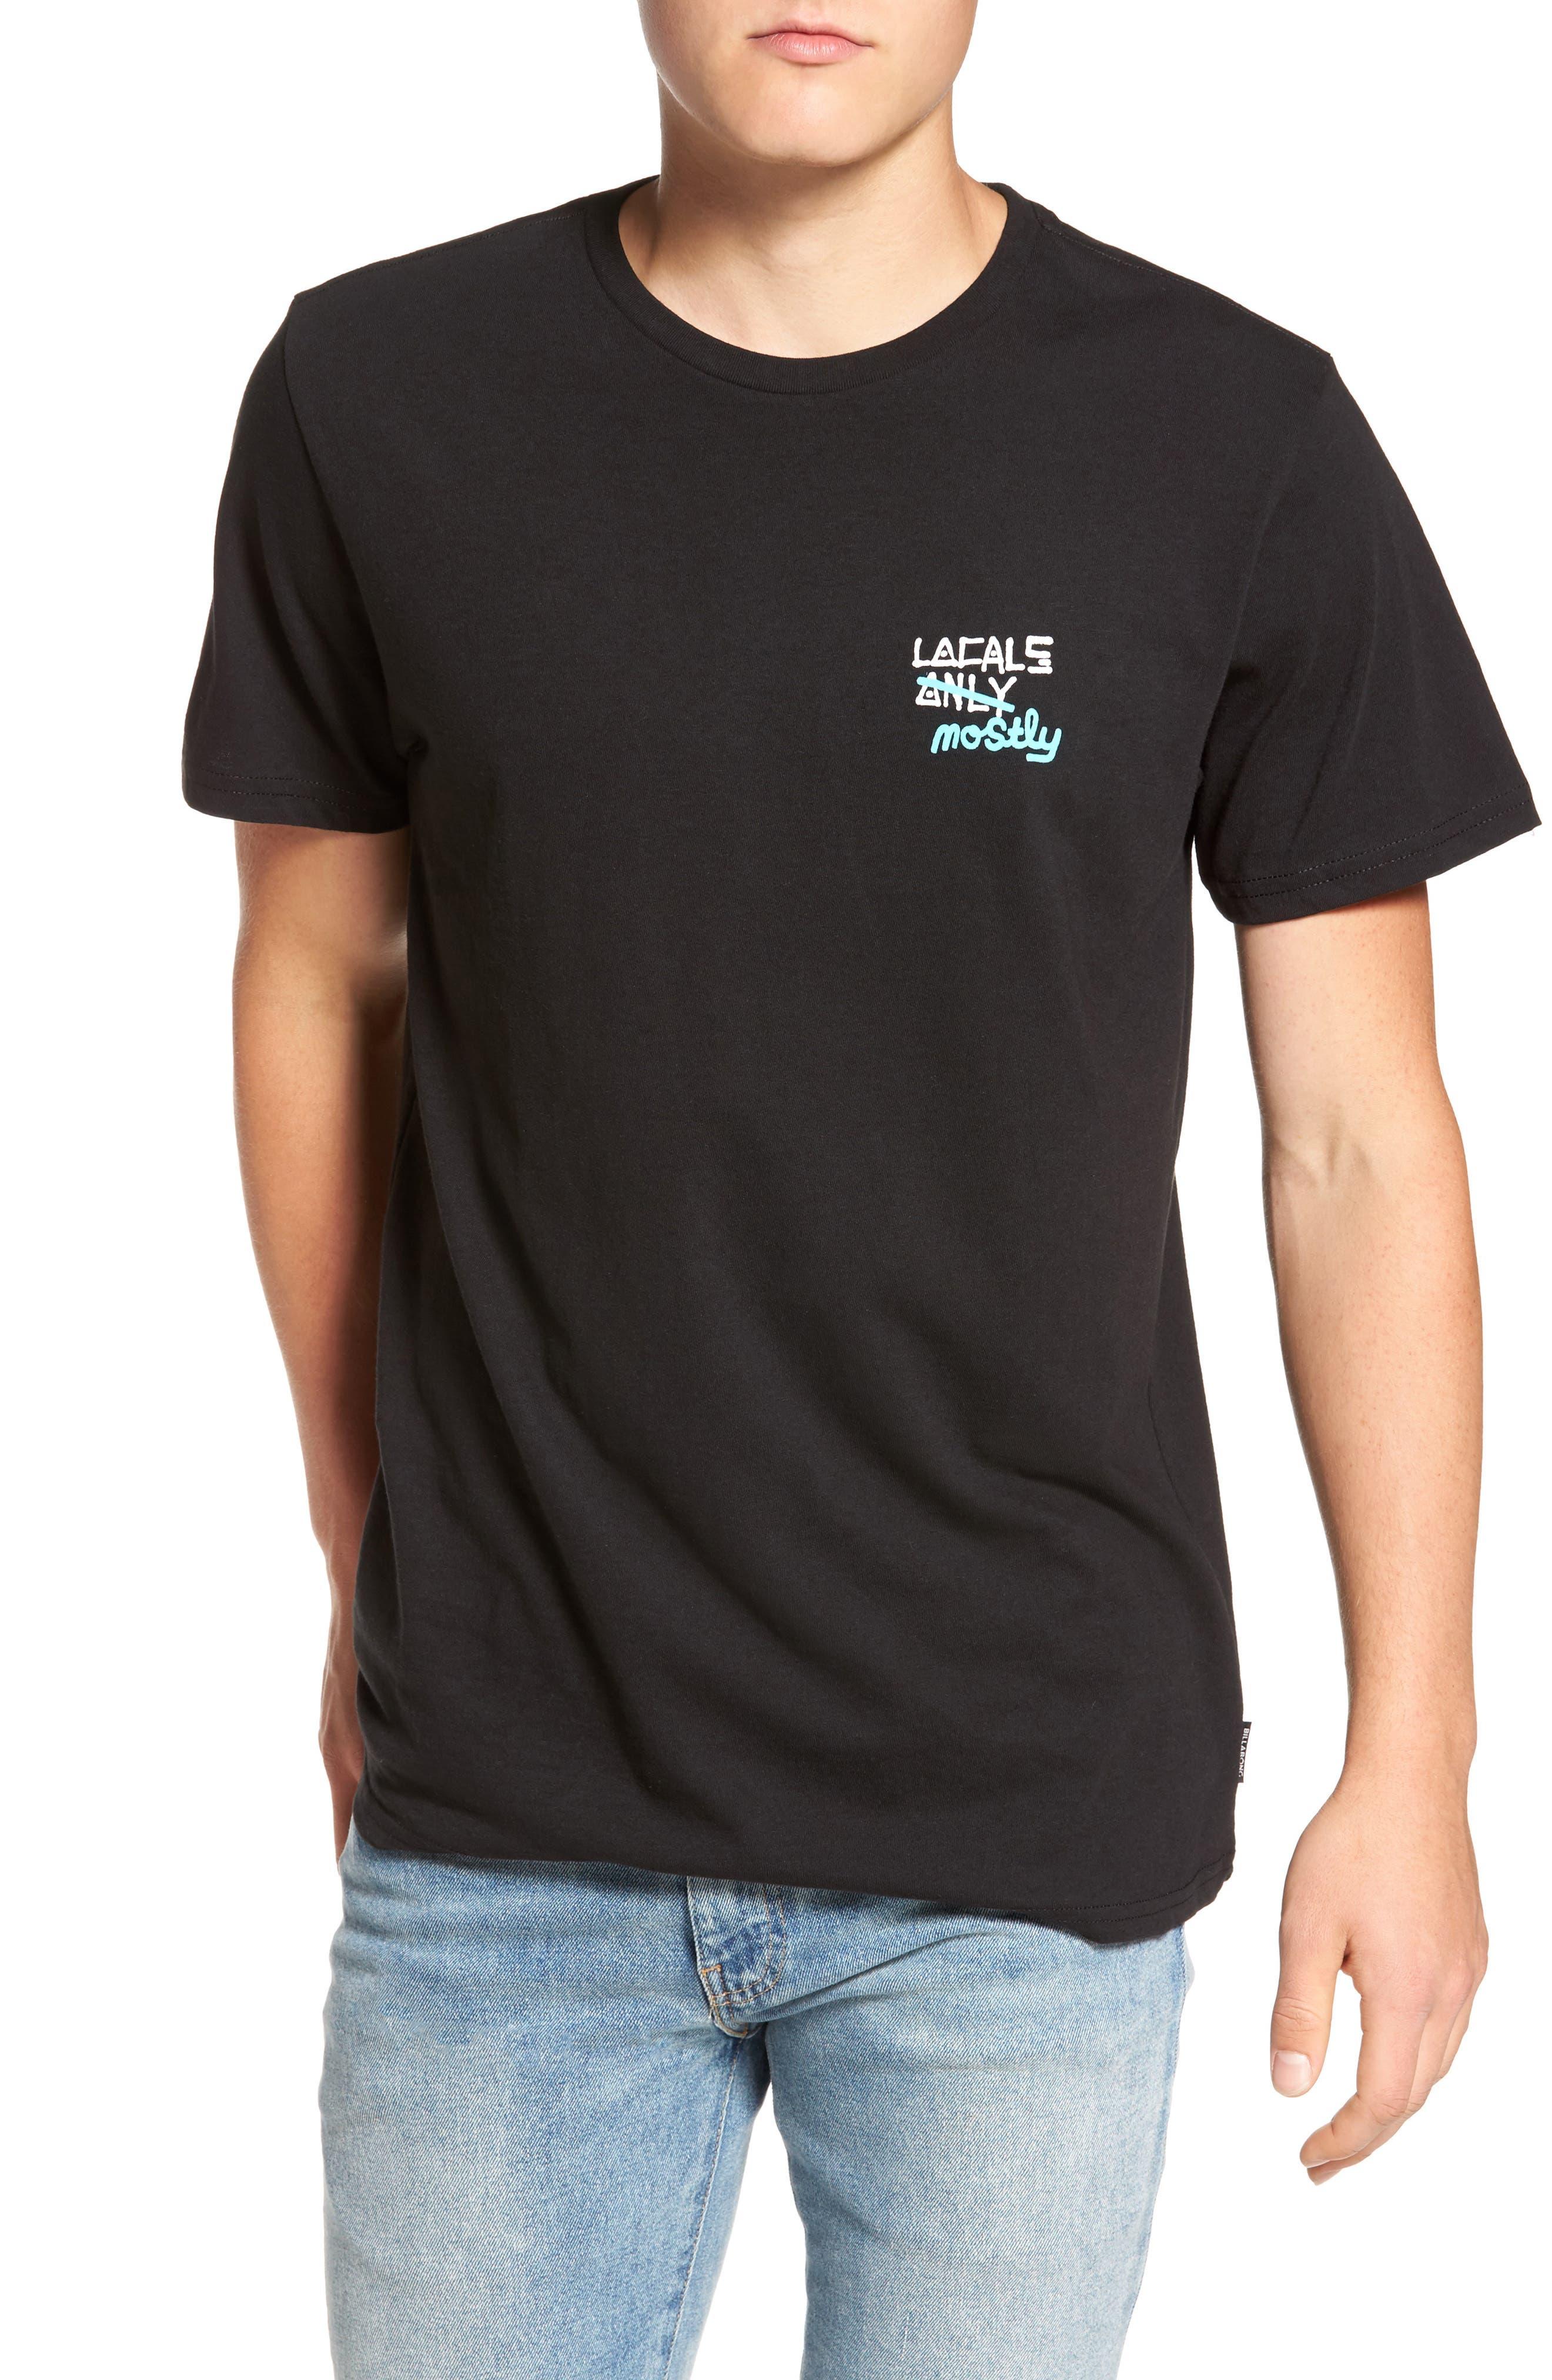 Billabong Locals Mostly Pelletier Graphic T-Shirt